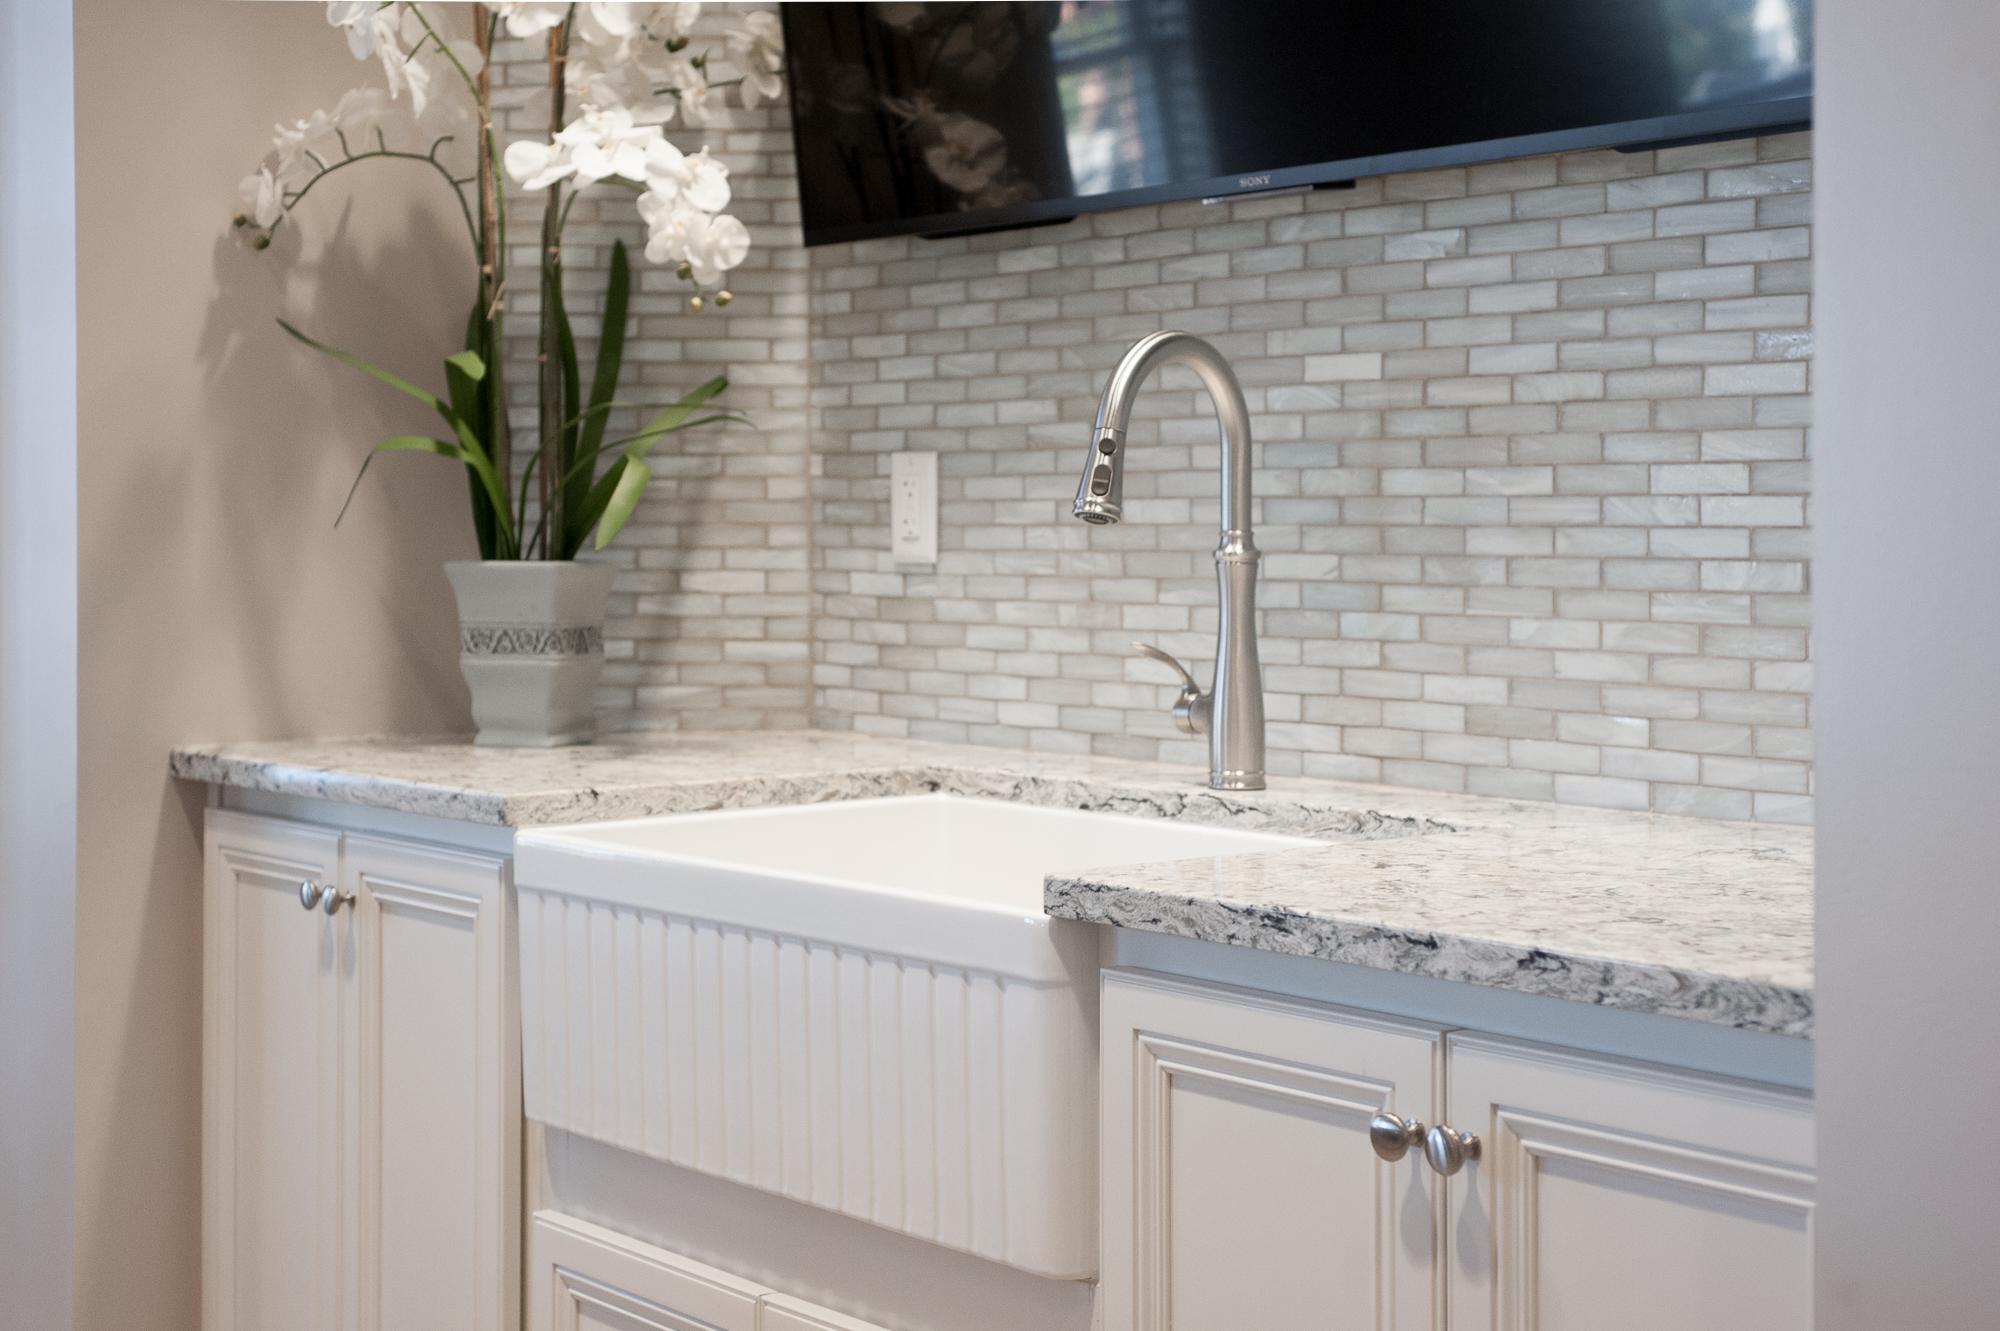 Micamy_Design_Studio_Interior_Design_Markland_StAugustine_Clubhouse_OldFlorida_Coastal_Glass_Mosaic_Tile_Backsplash_Kitchen_Cambria_Kohler_Blue_.jpg